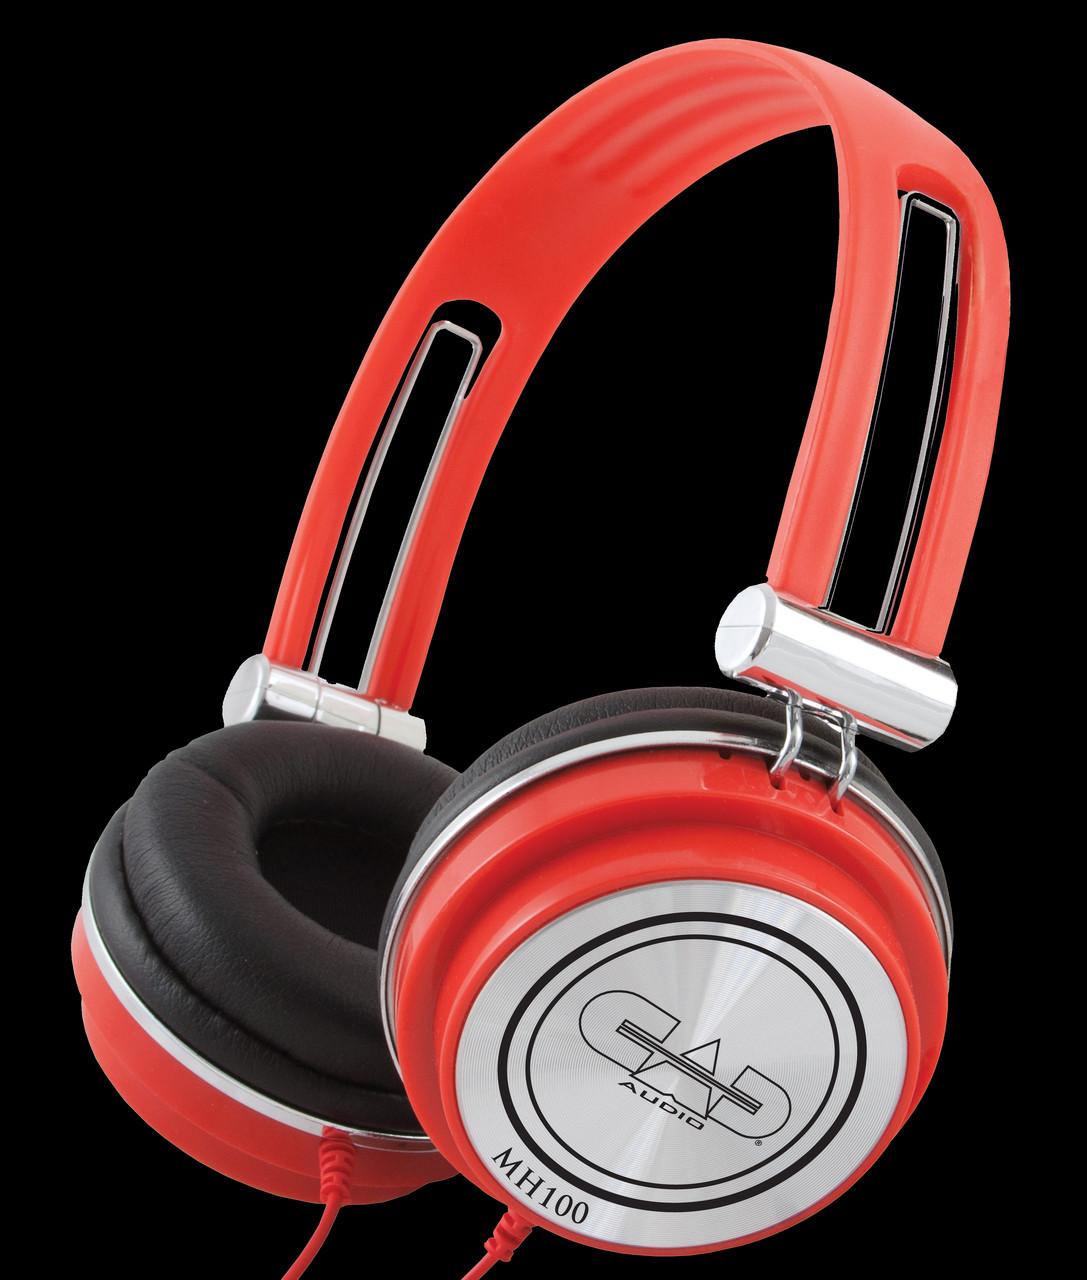 CAD Closed-back Light / Compact DJ Studio Headphones